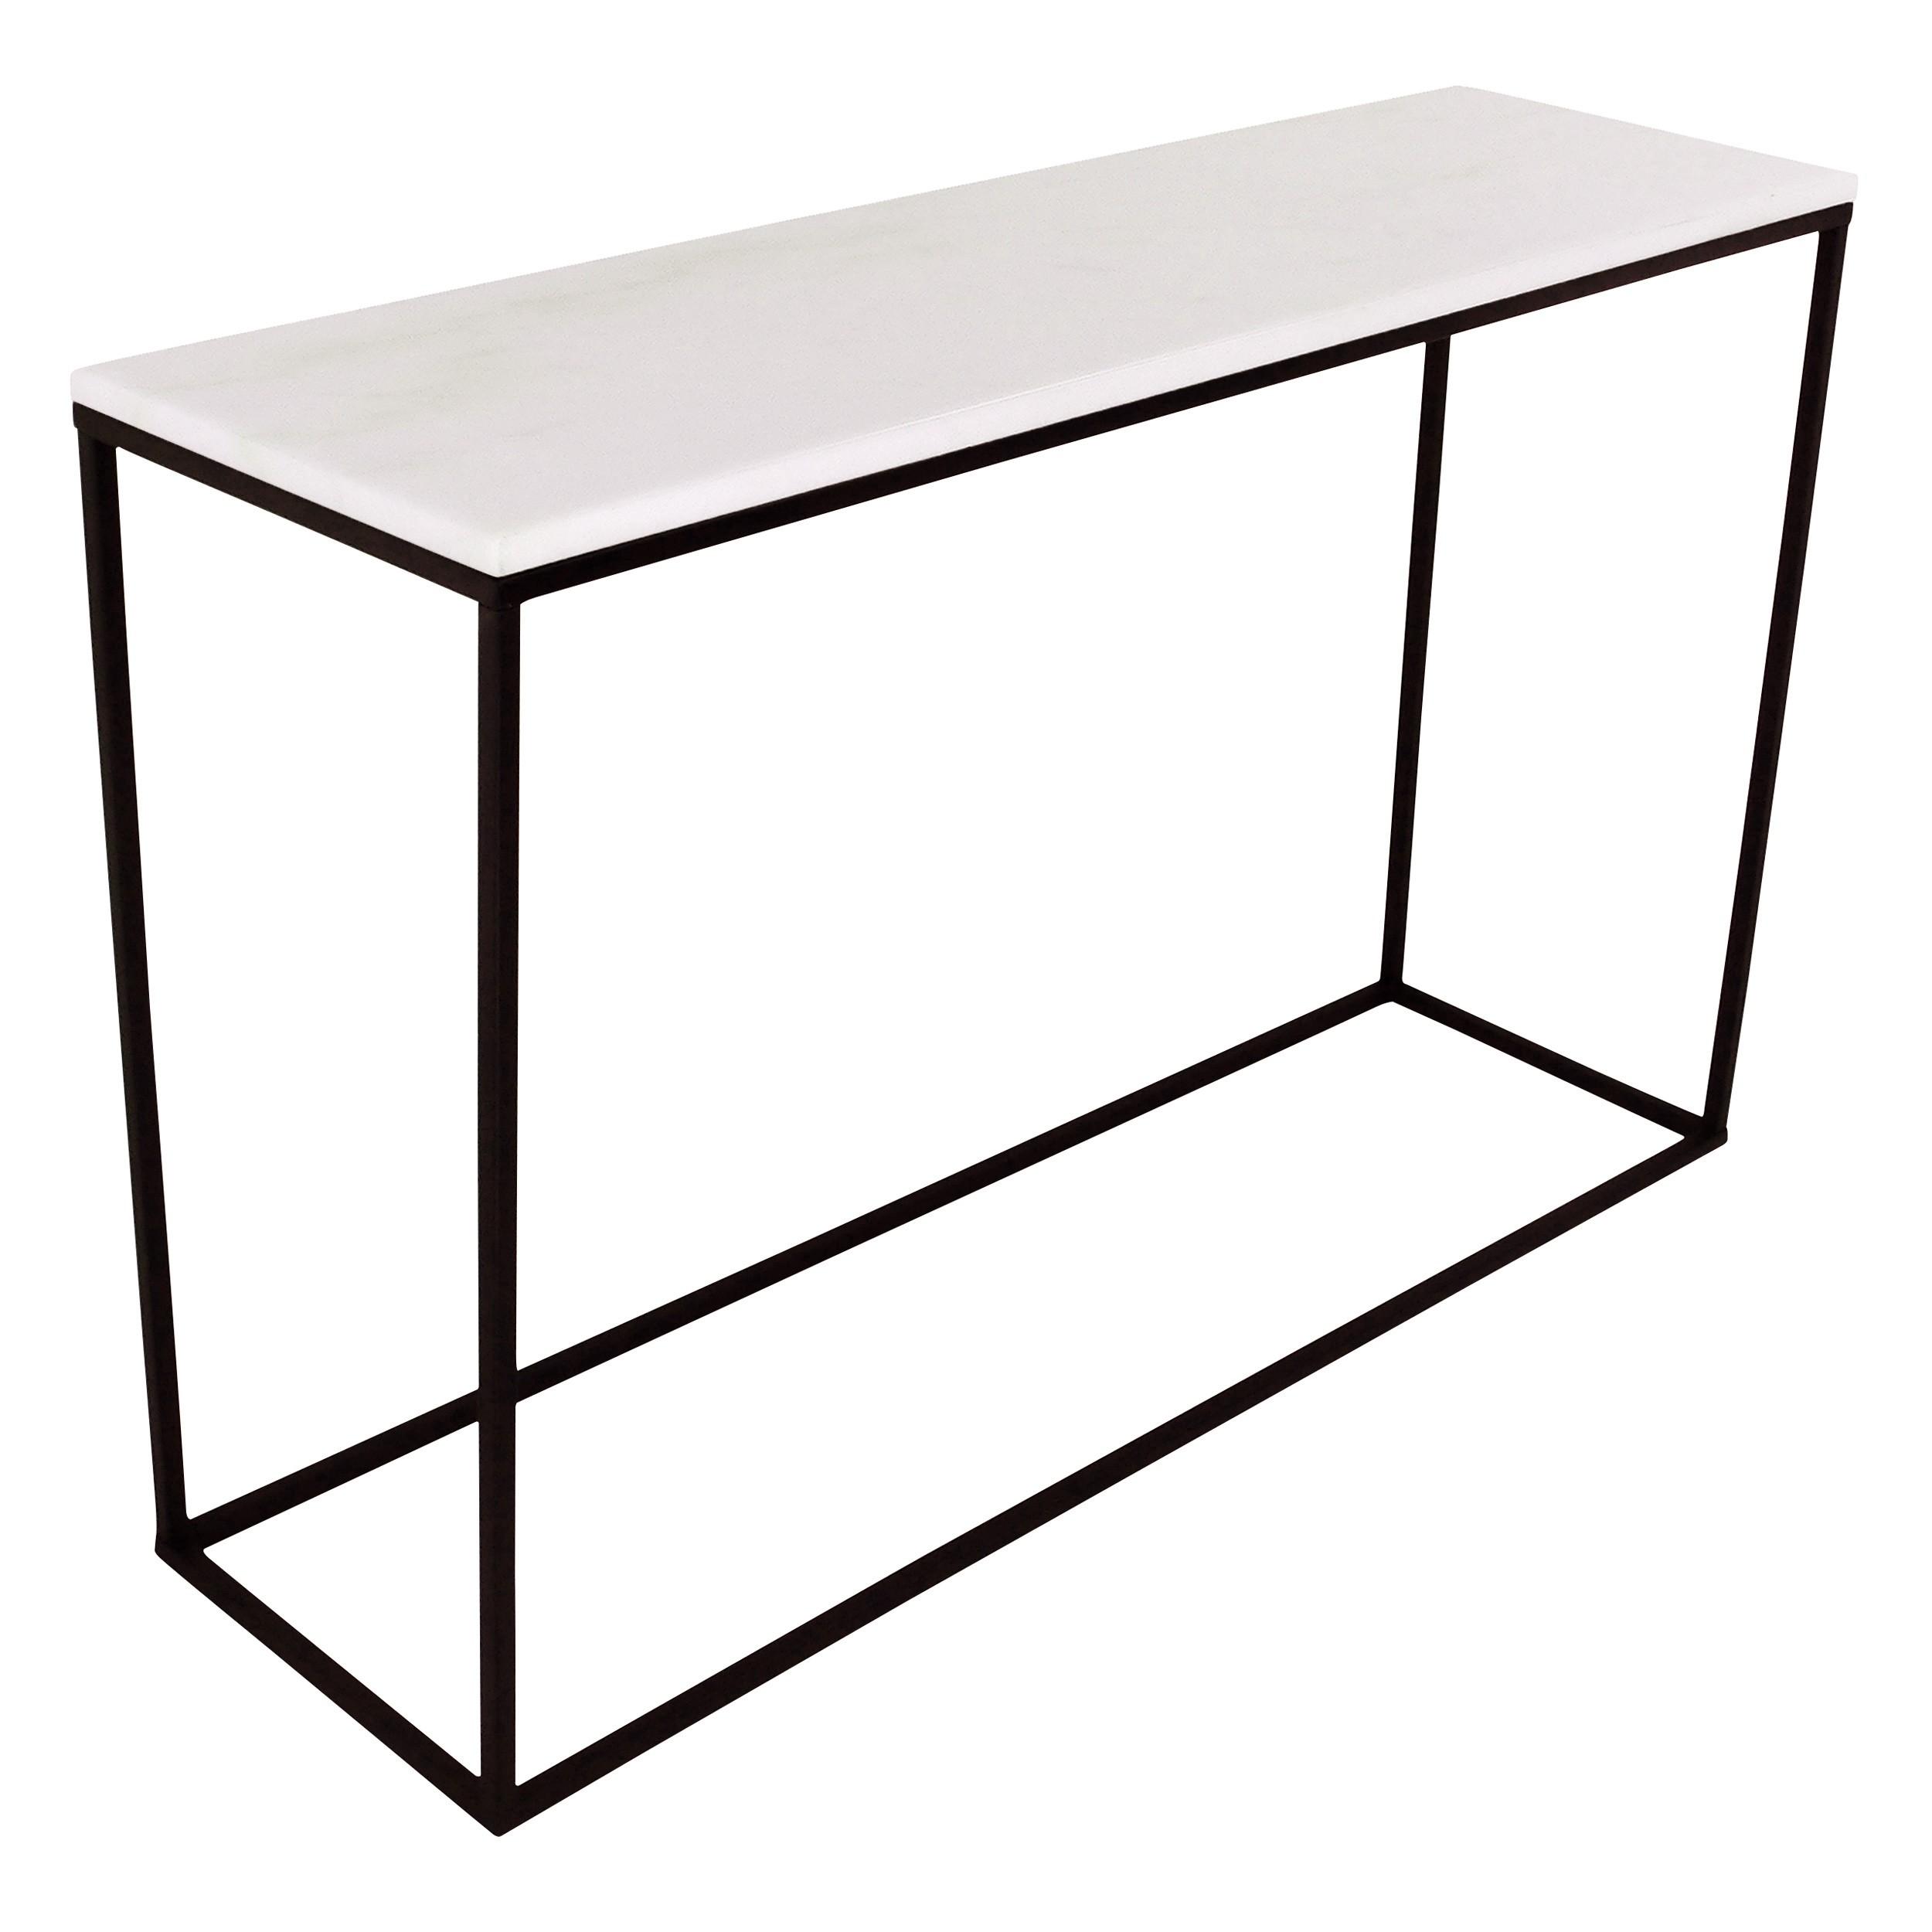 console dagmar marbre blanche commandez nos consoles dagmar marbre blanches design rdv d co. Black Bedroom Furniture Sets. Home Design Ideas